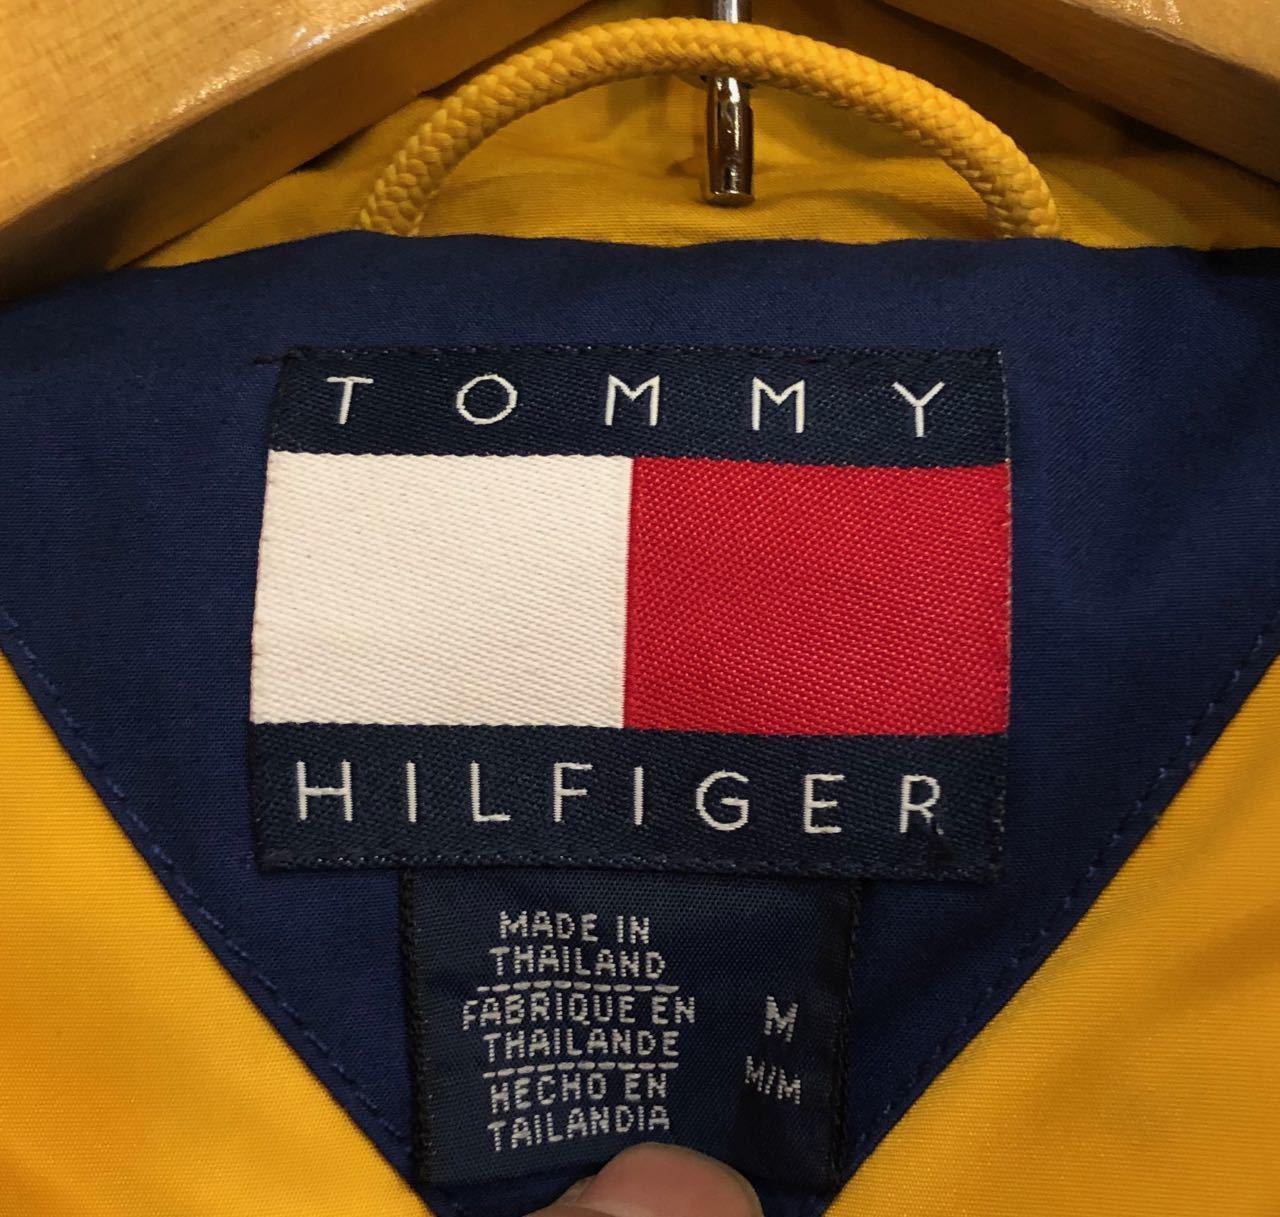 90s TOMMY HILFIGER DOWN JACKET  トミーフィルフィガー ダウンジャケット!_c0144020_14120503.jpg